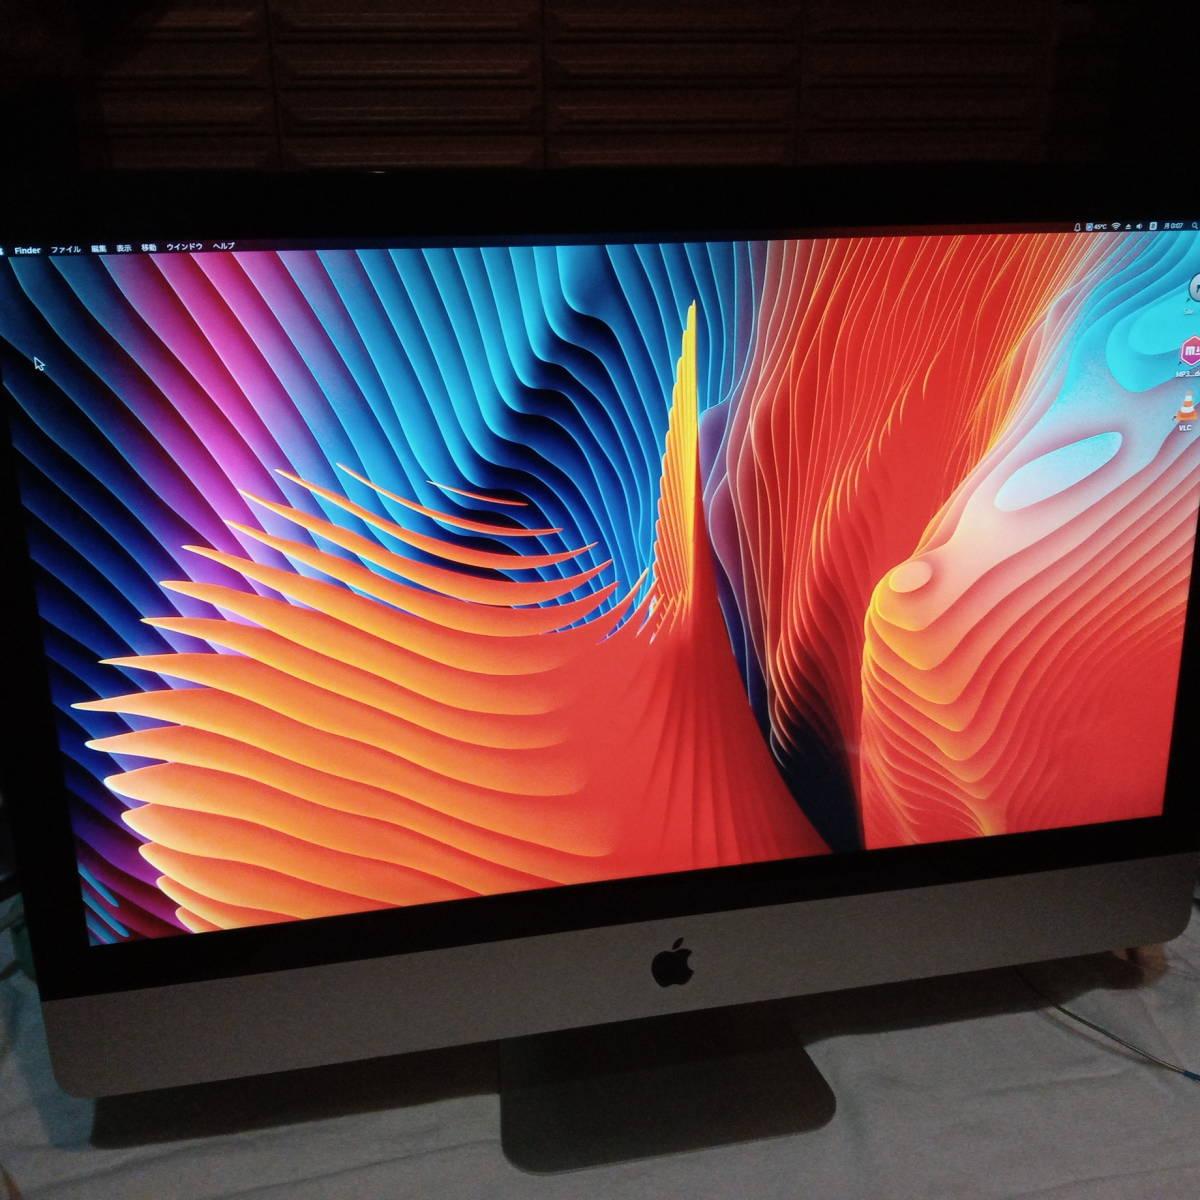 iMac 27インチ動作OK 初期化済み 発色良好 core i5 メモリ:12G HDD:1TB SuperDrive有